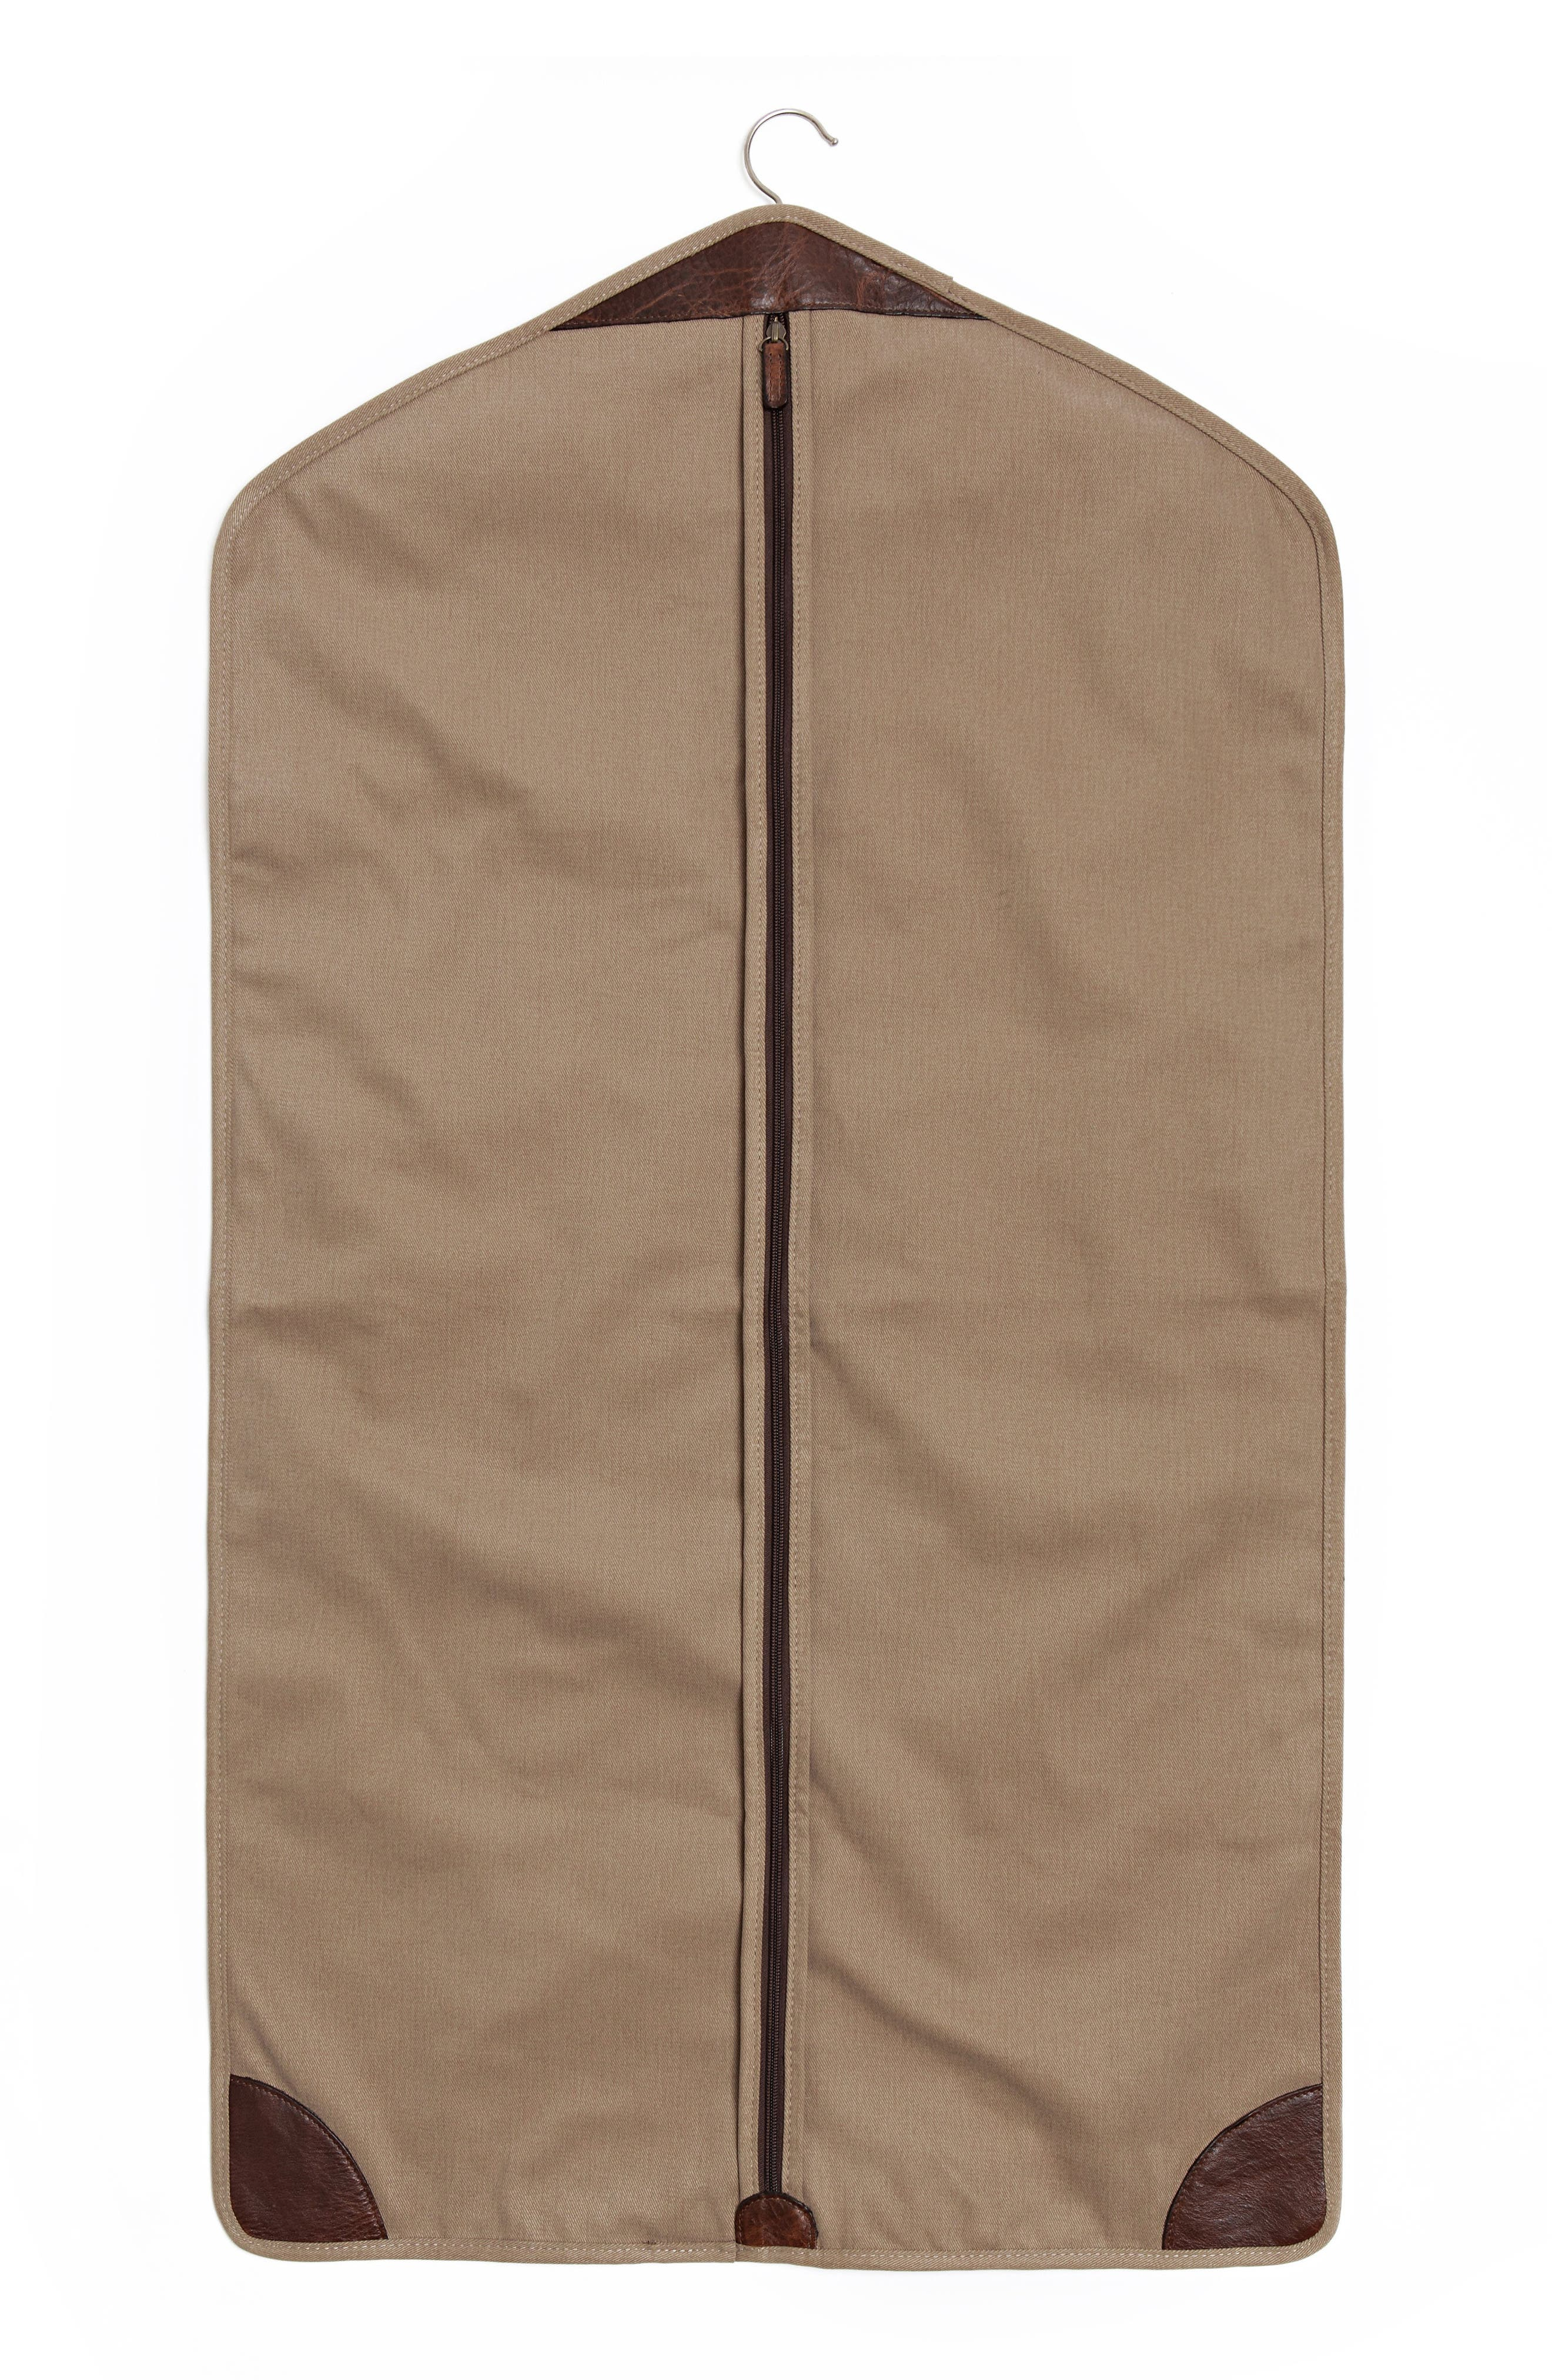 Holton Garment Bag,                         Main,                         color, 206